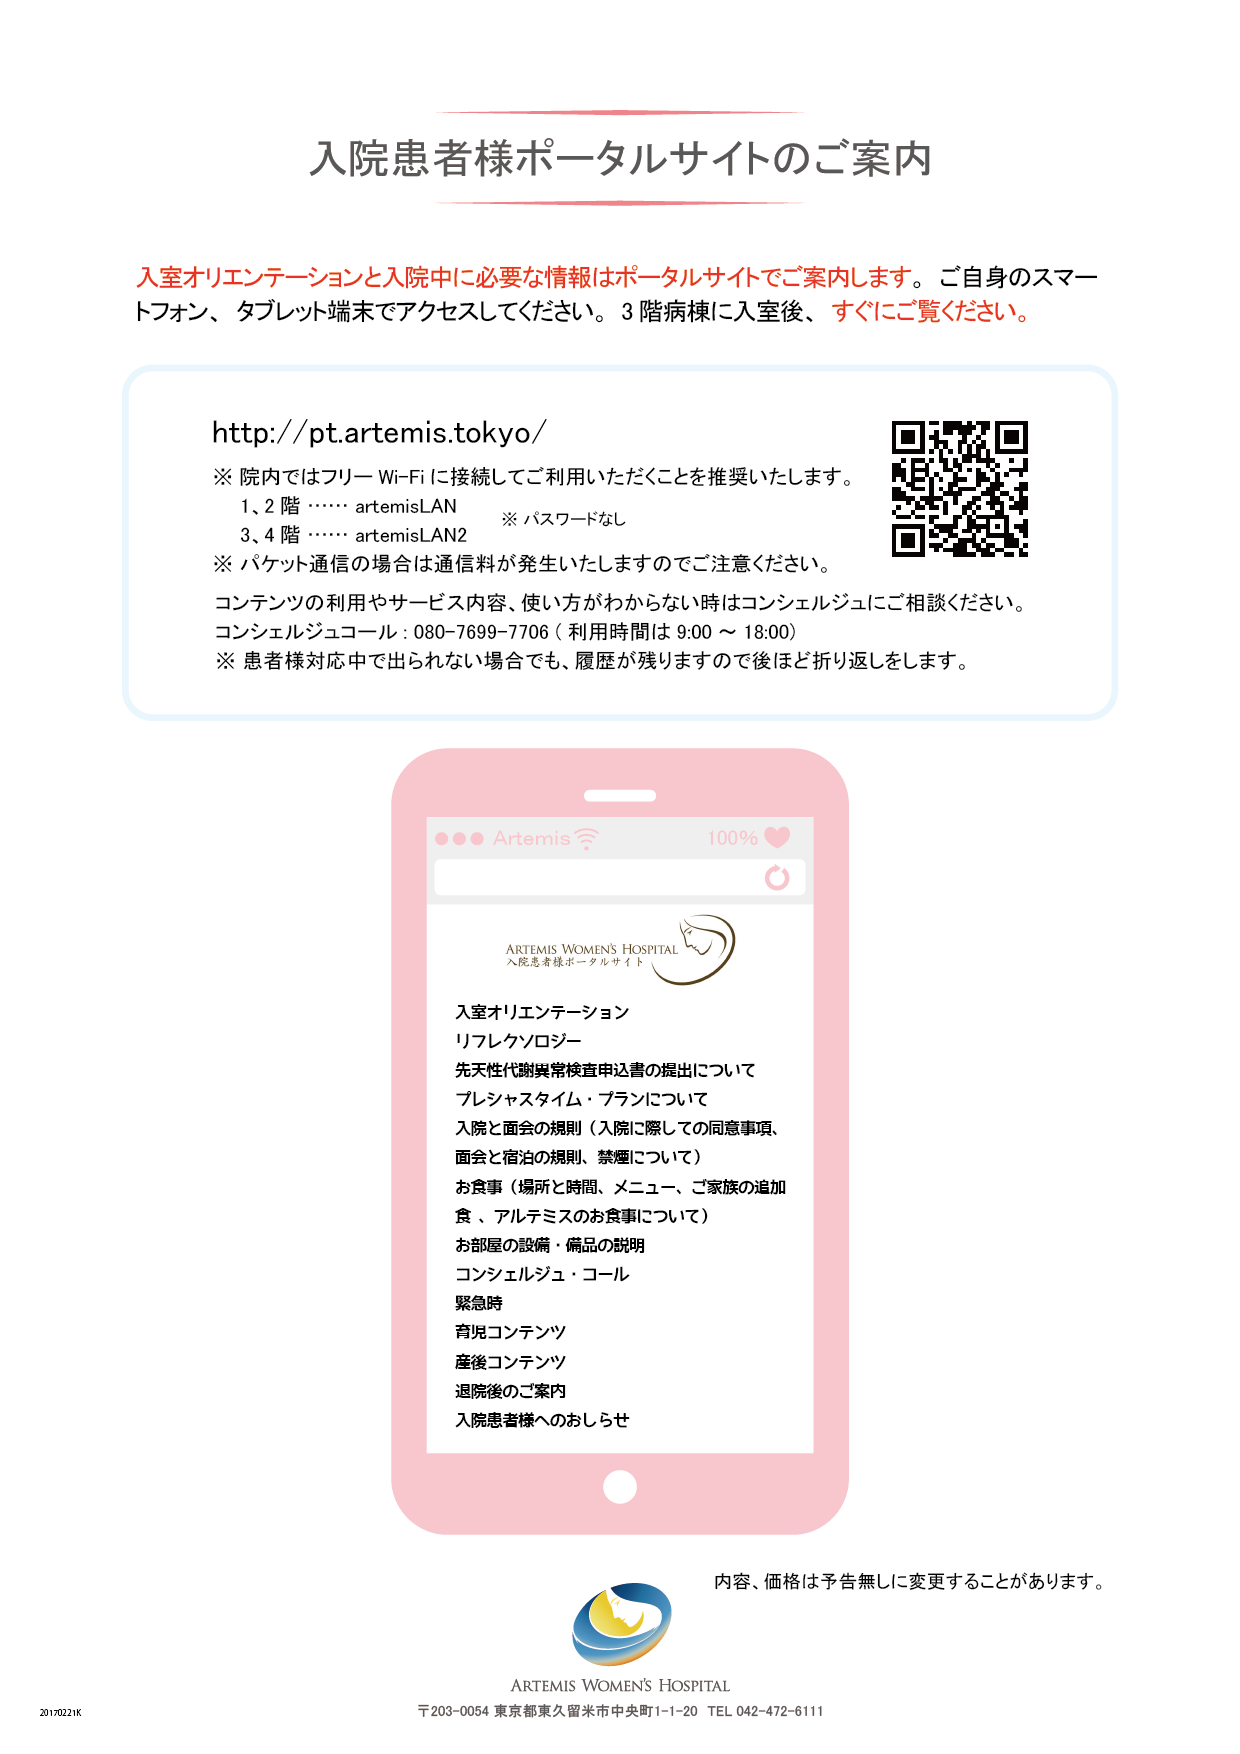 35_20170119